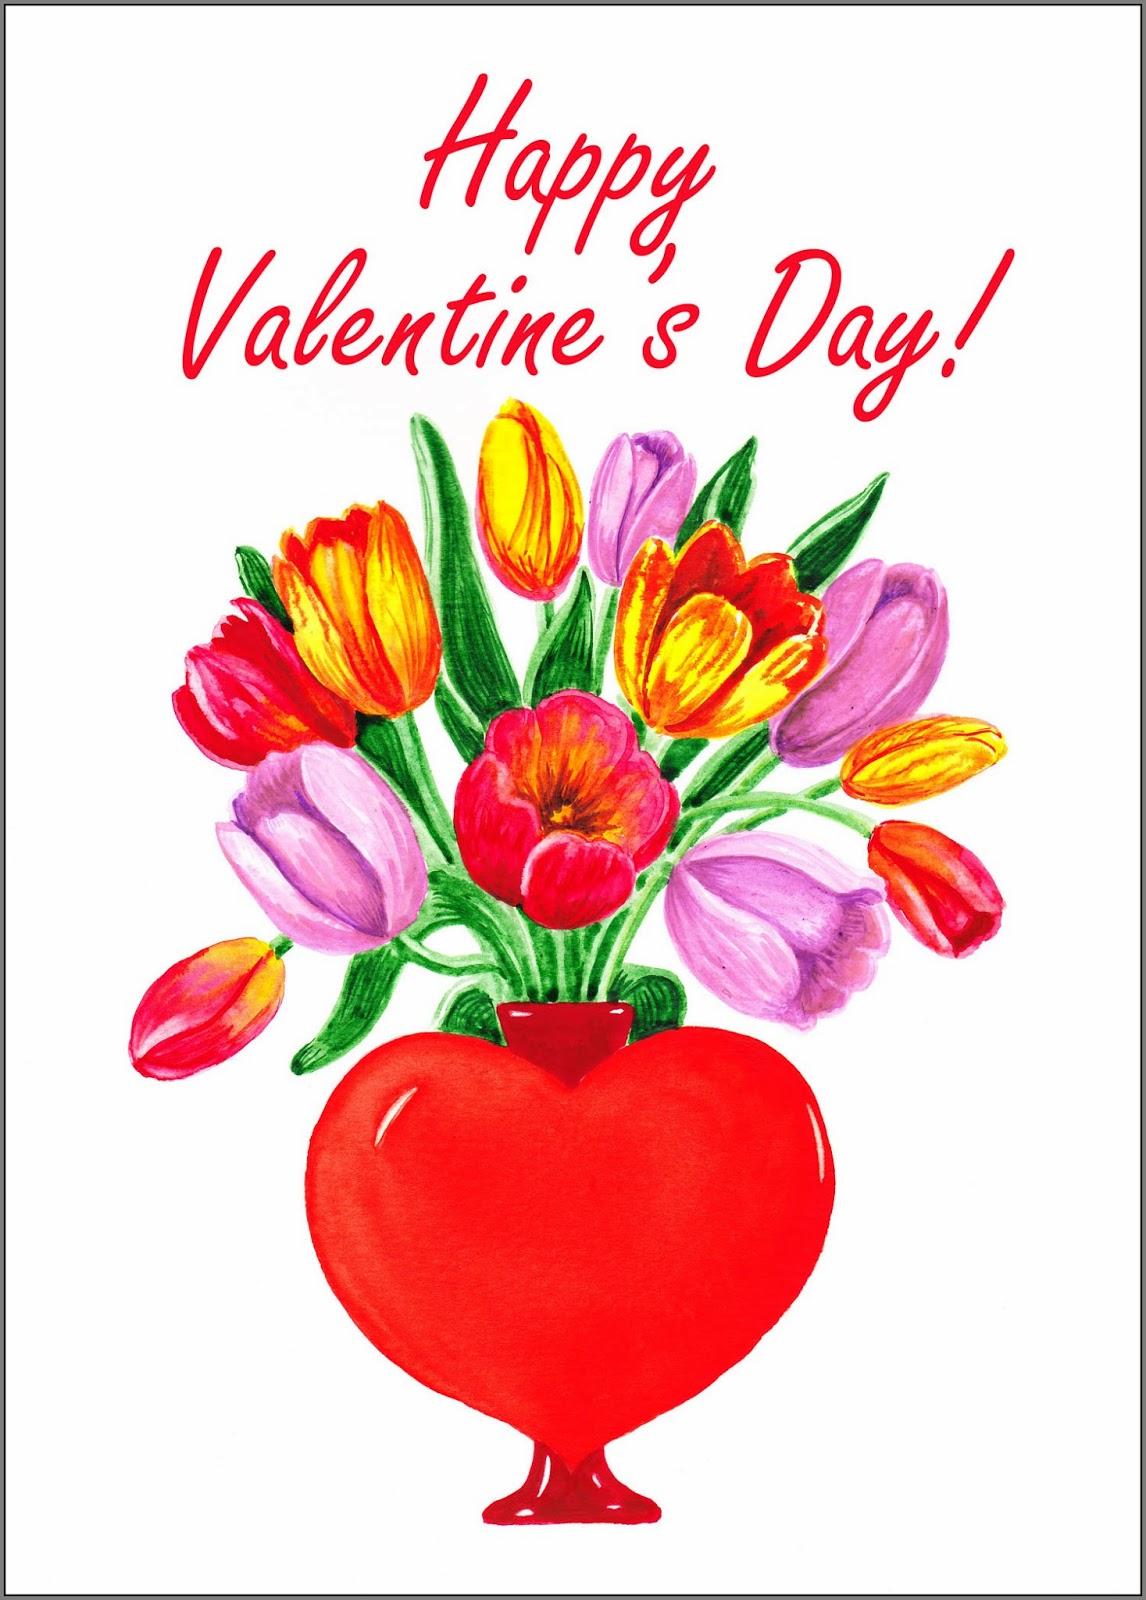 Red Yellow Purple tulips Heart vase